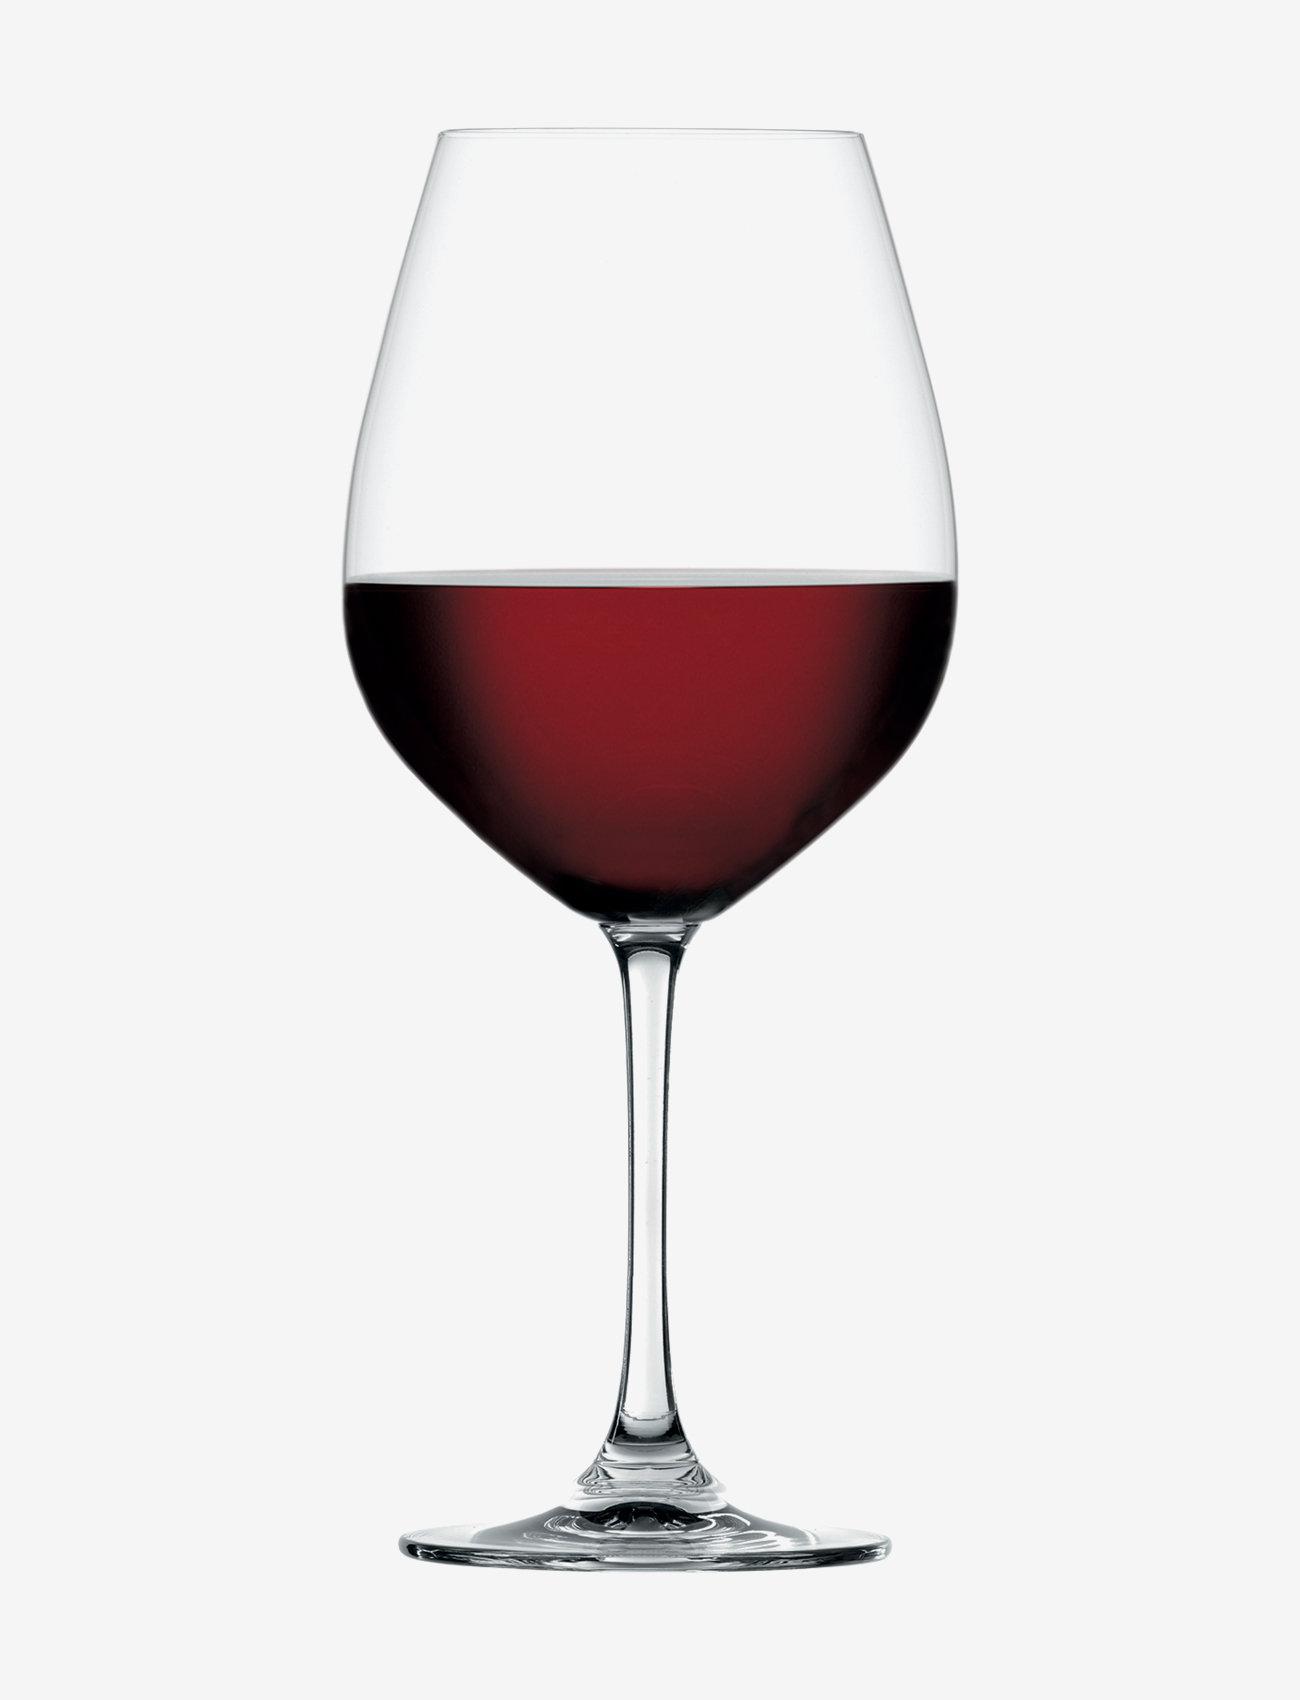 Spiegelau - Salute Burgundy Glas 81 cl 4-p - vinglass - clear glass - 1